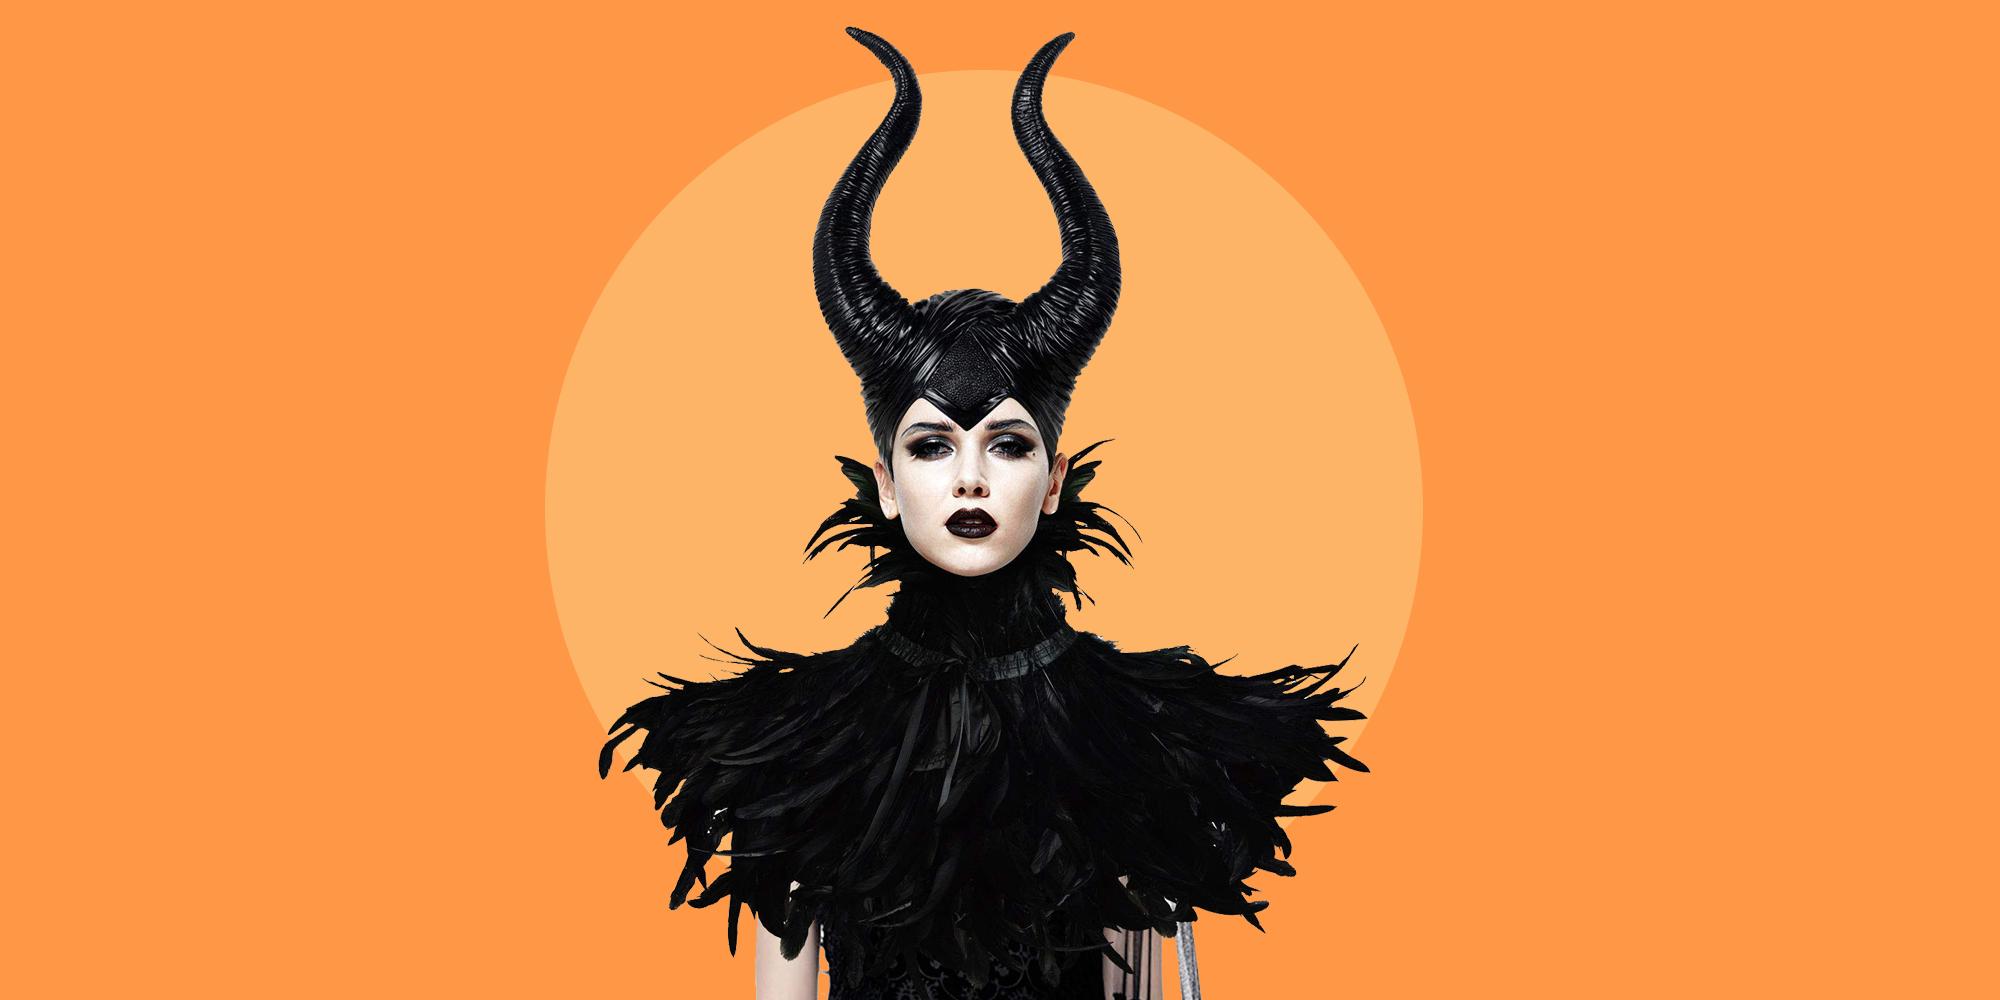 Halloween 2020 Mechanic Death 30 Scary Halloween Costumes   Creepy Halloween Costume Ideas